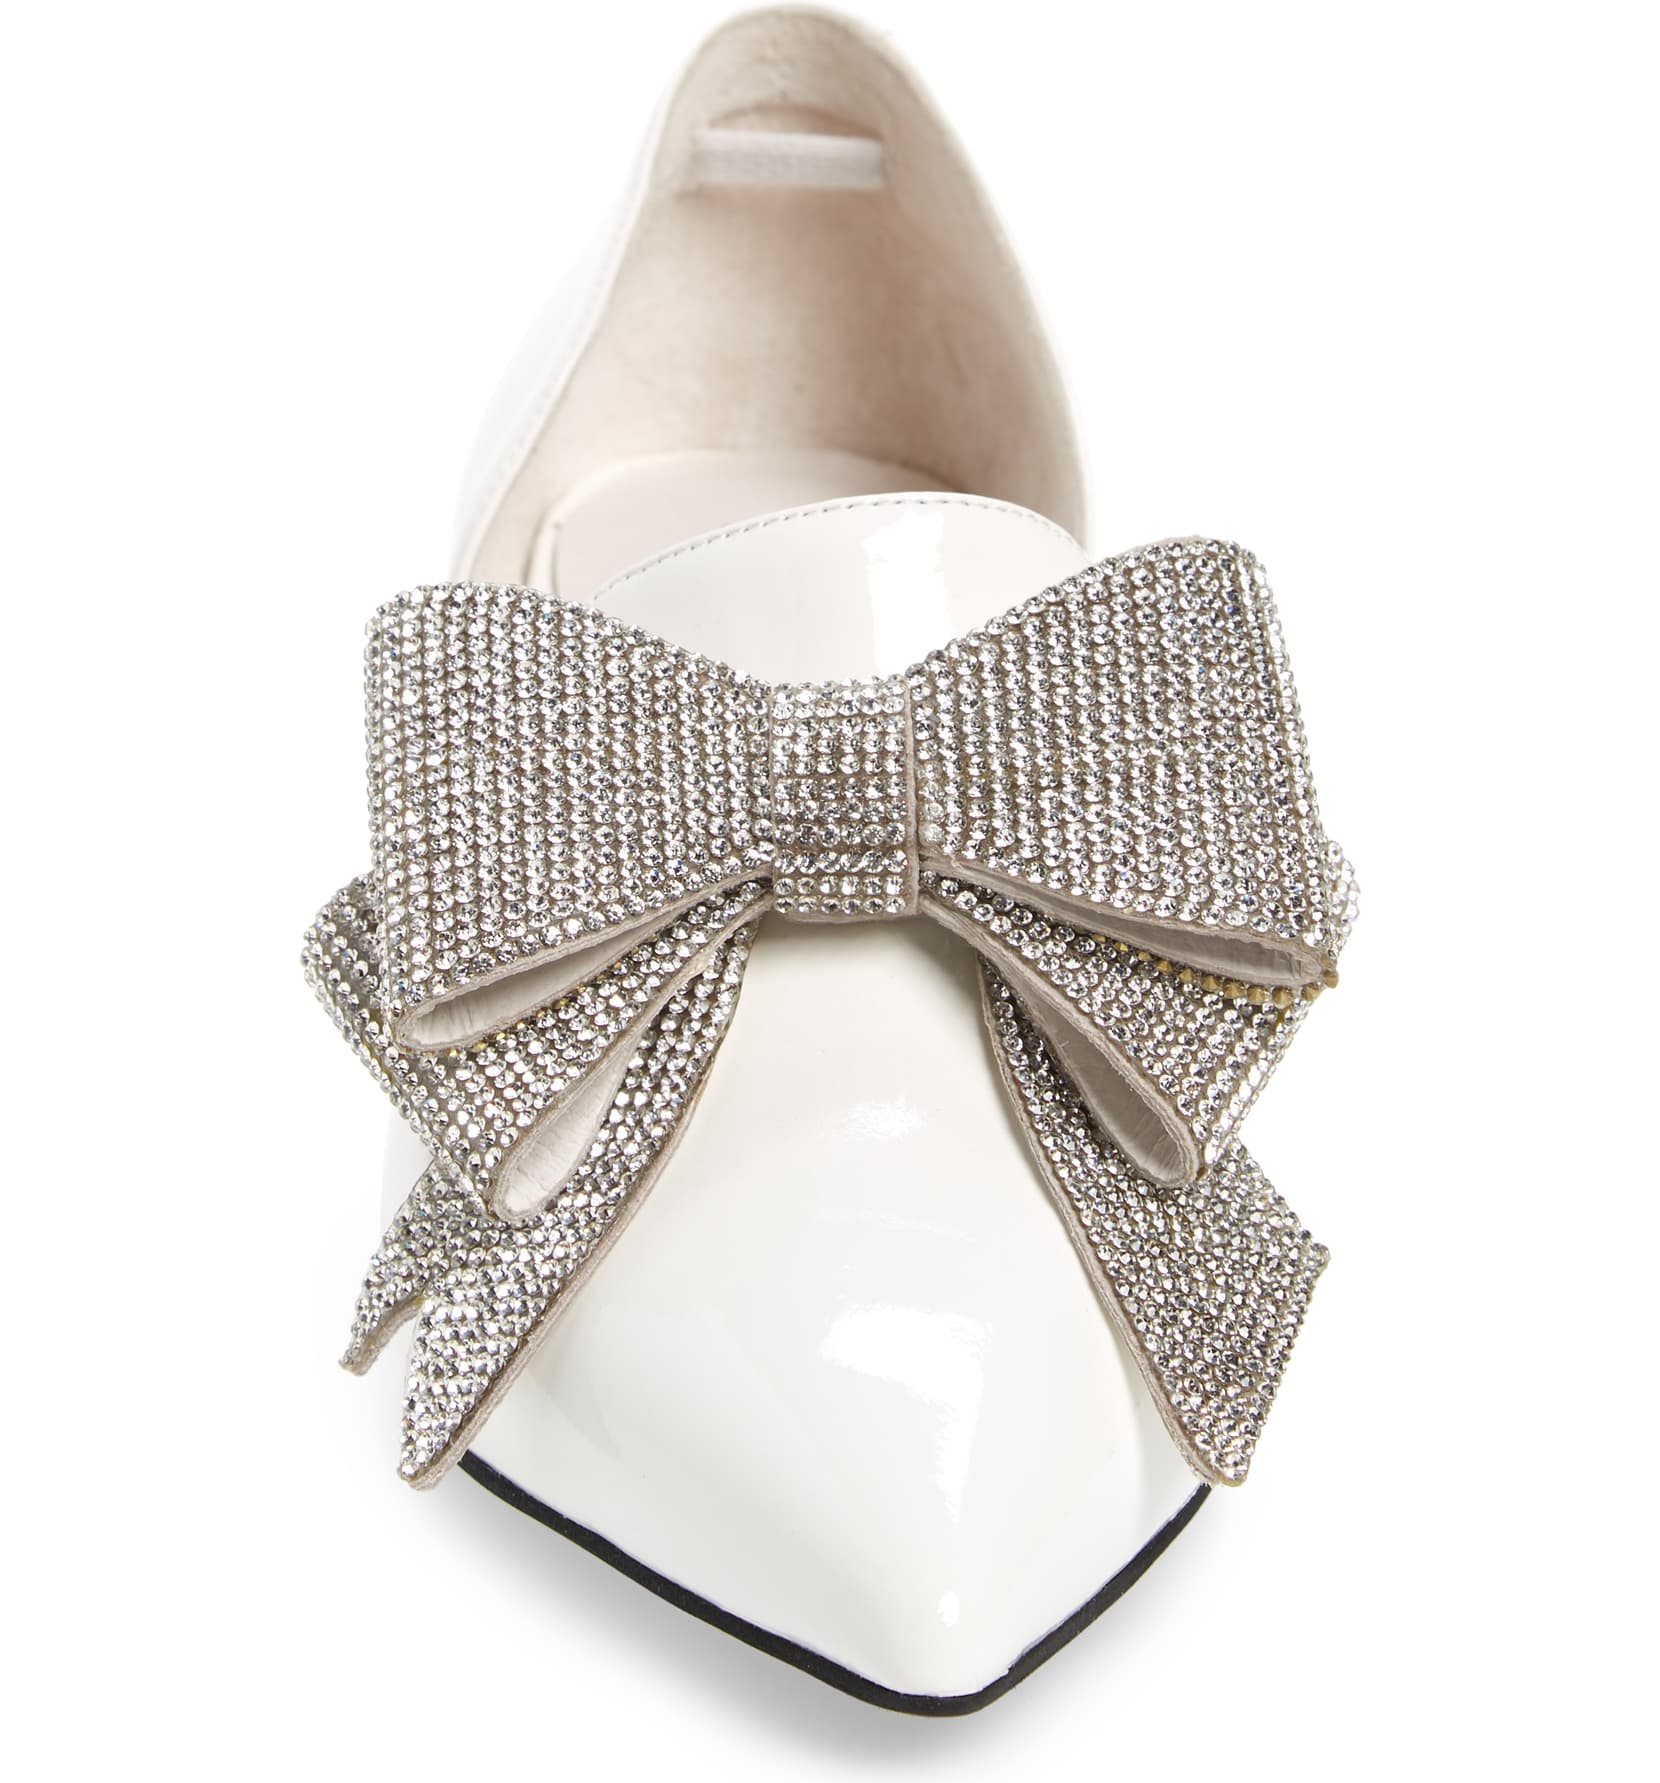 Jeffery-Campbell-Valenti-White-Silver-Patent-Bow-Metallic-Heel-Loafer thumbnail 5